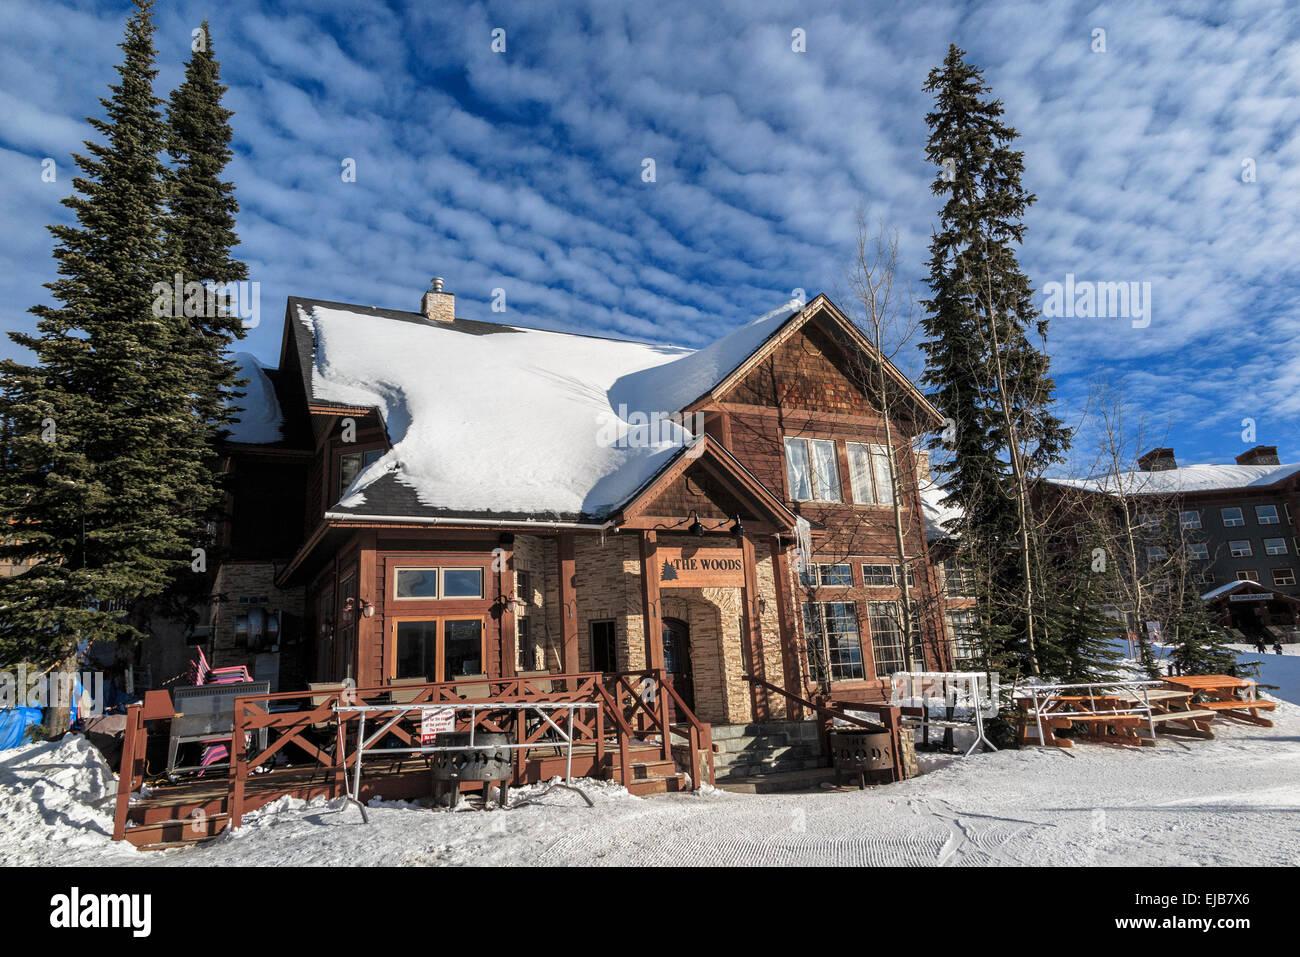 ski restaurant stock photos & ski restaurant stock images - page 2